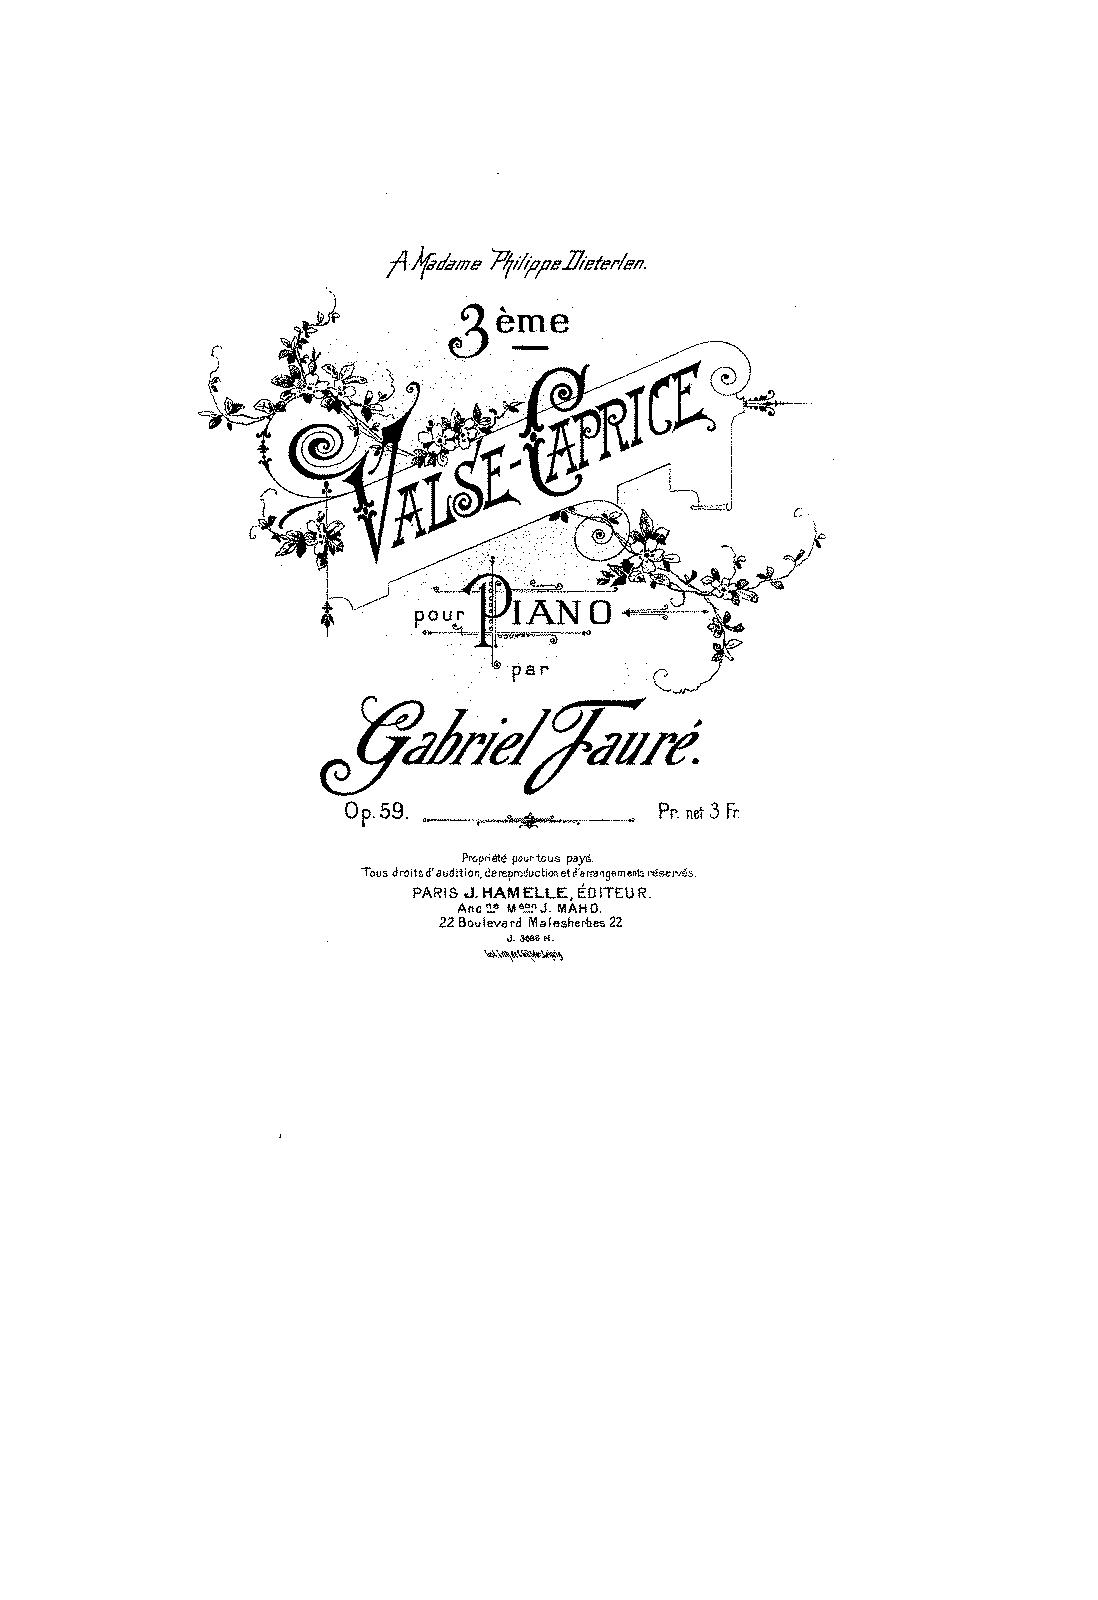 Valse Caprice No 3 Op 59 Faure Gabriel